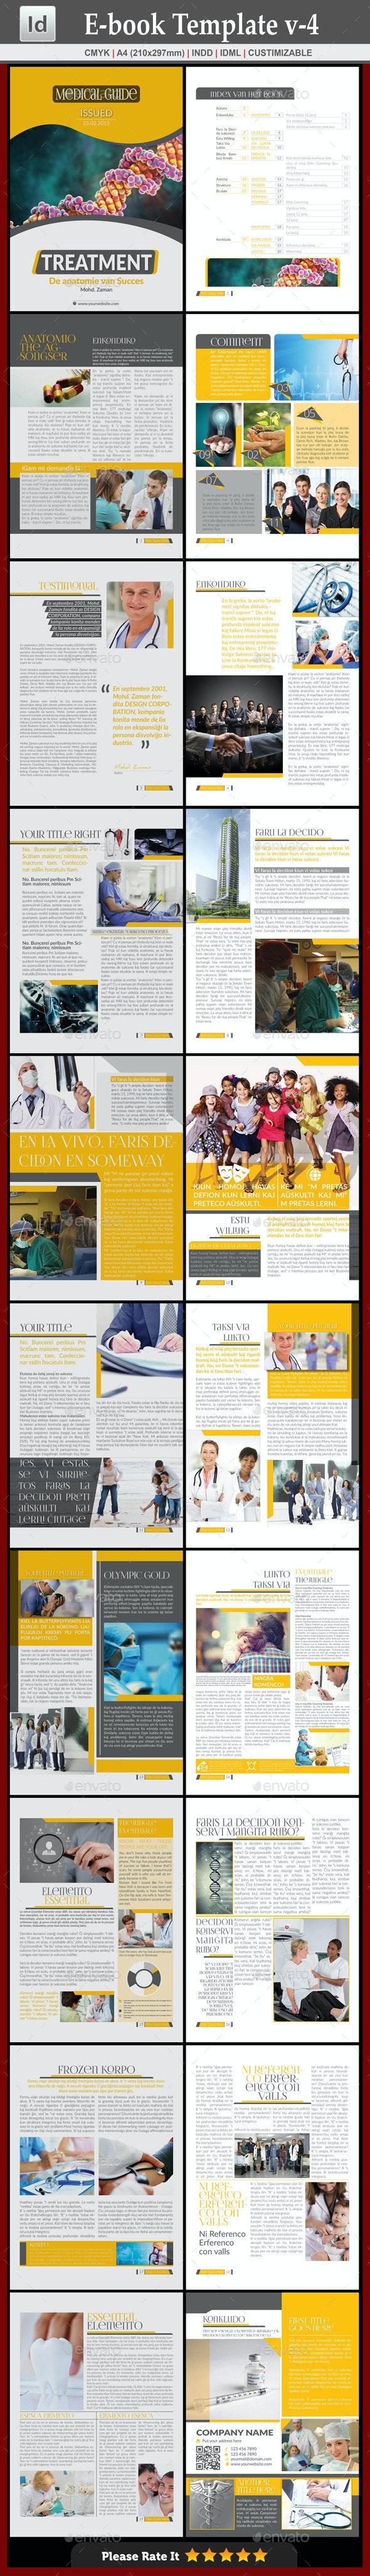 E-Book Template v-4 - Digital Books ePublishing